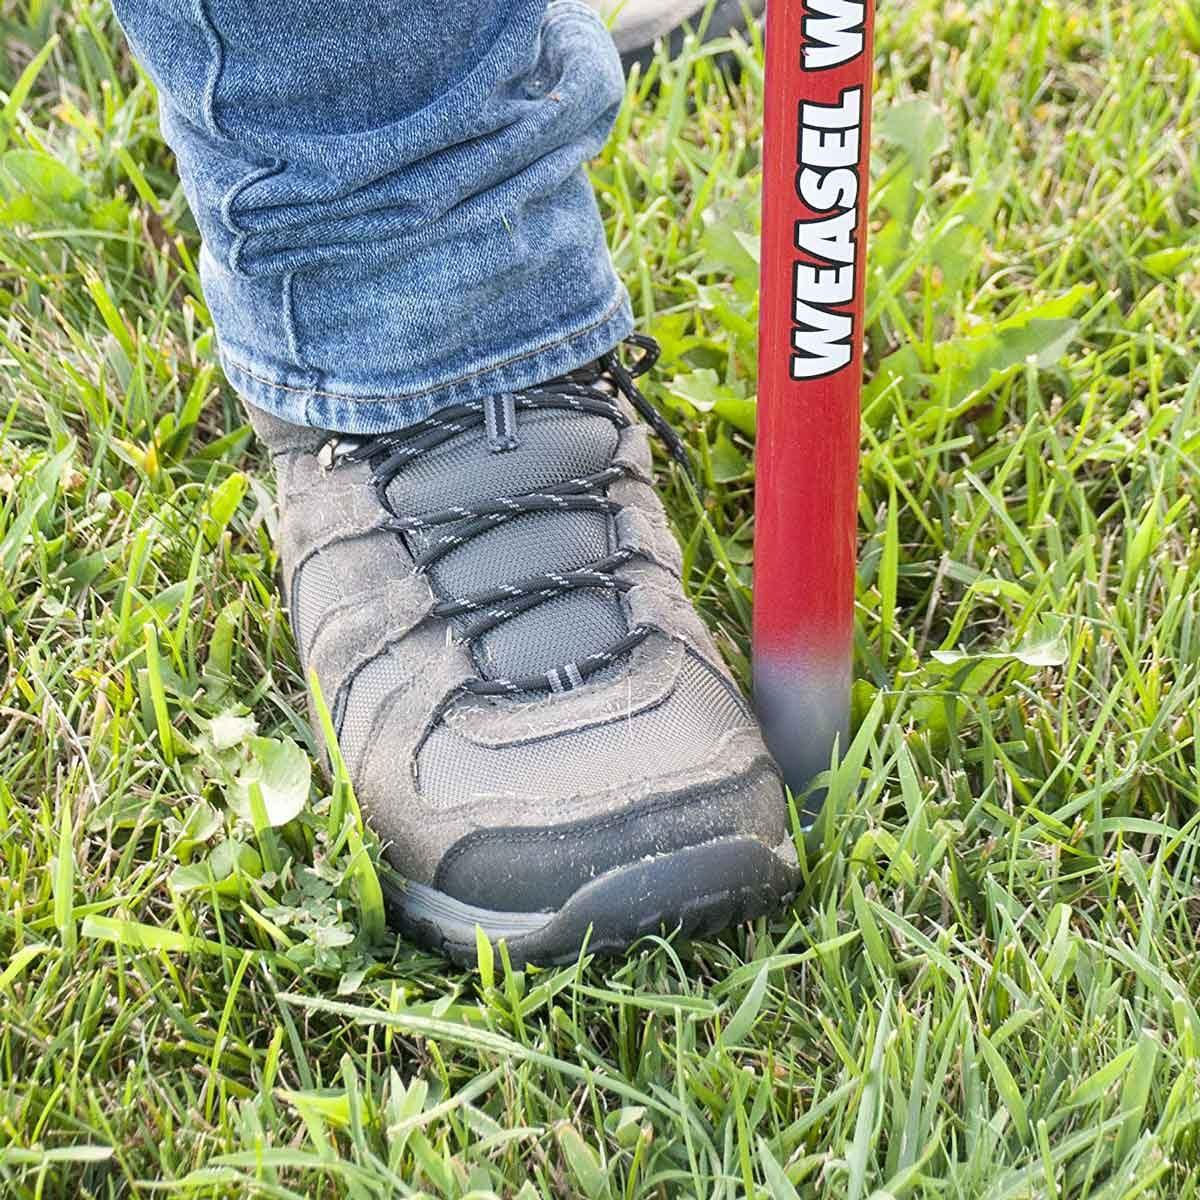 Standing lawn weeder